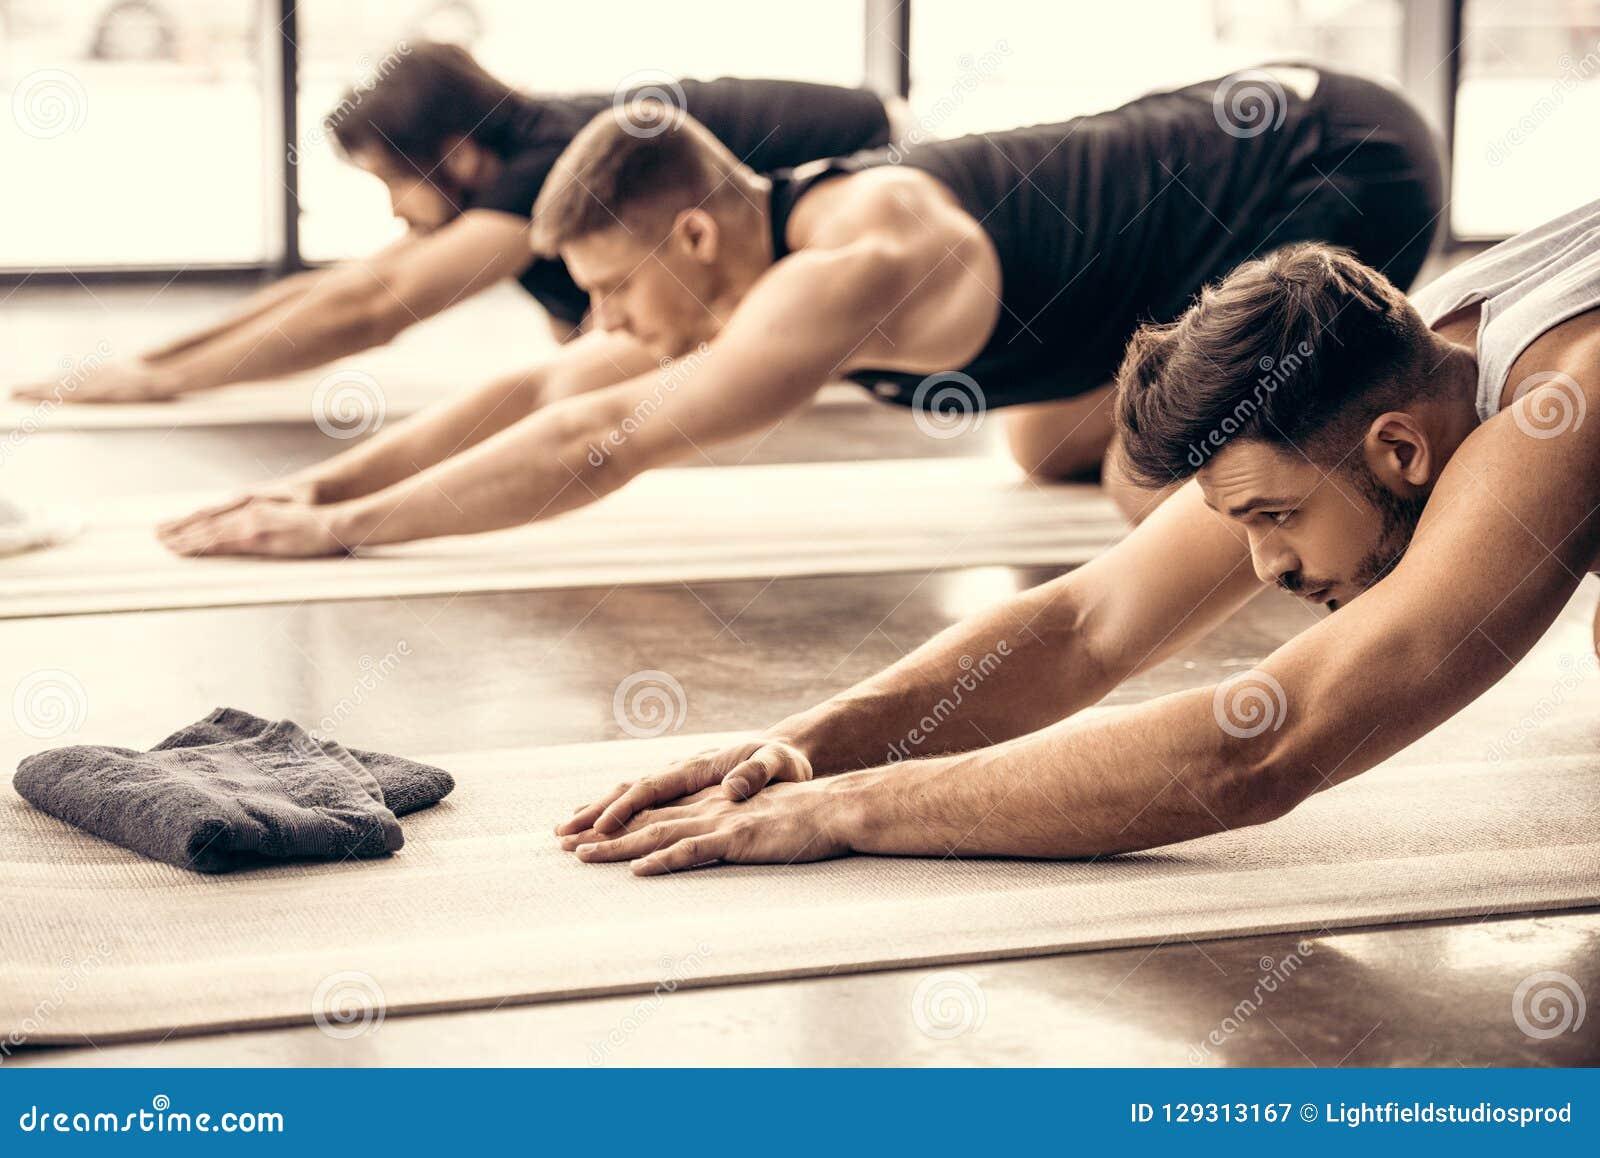 handsome sportsmen simultaneously stretching backs